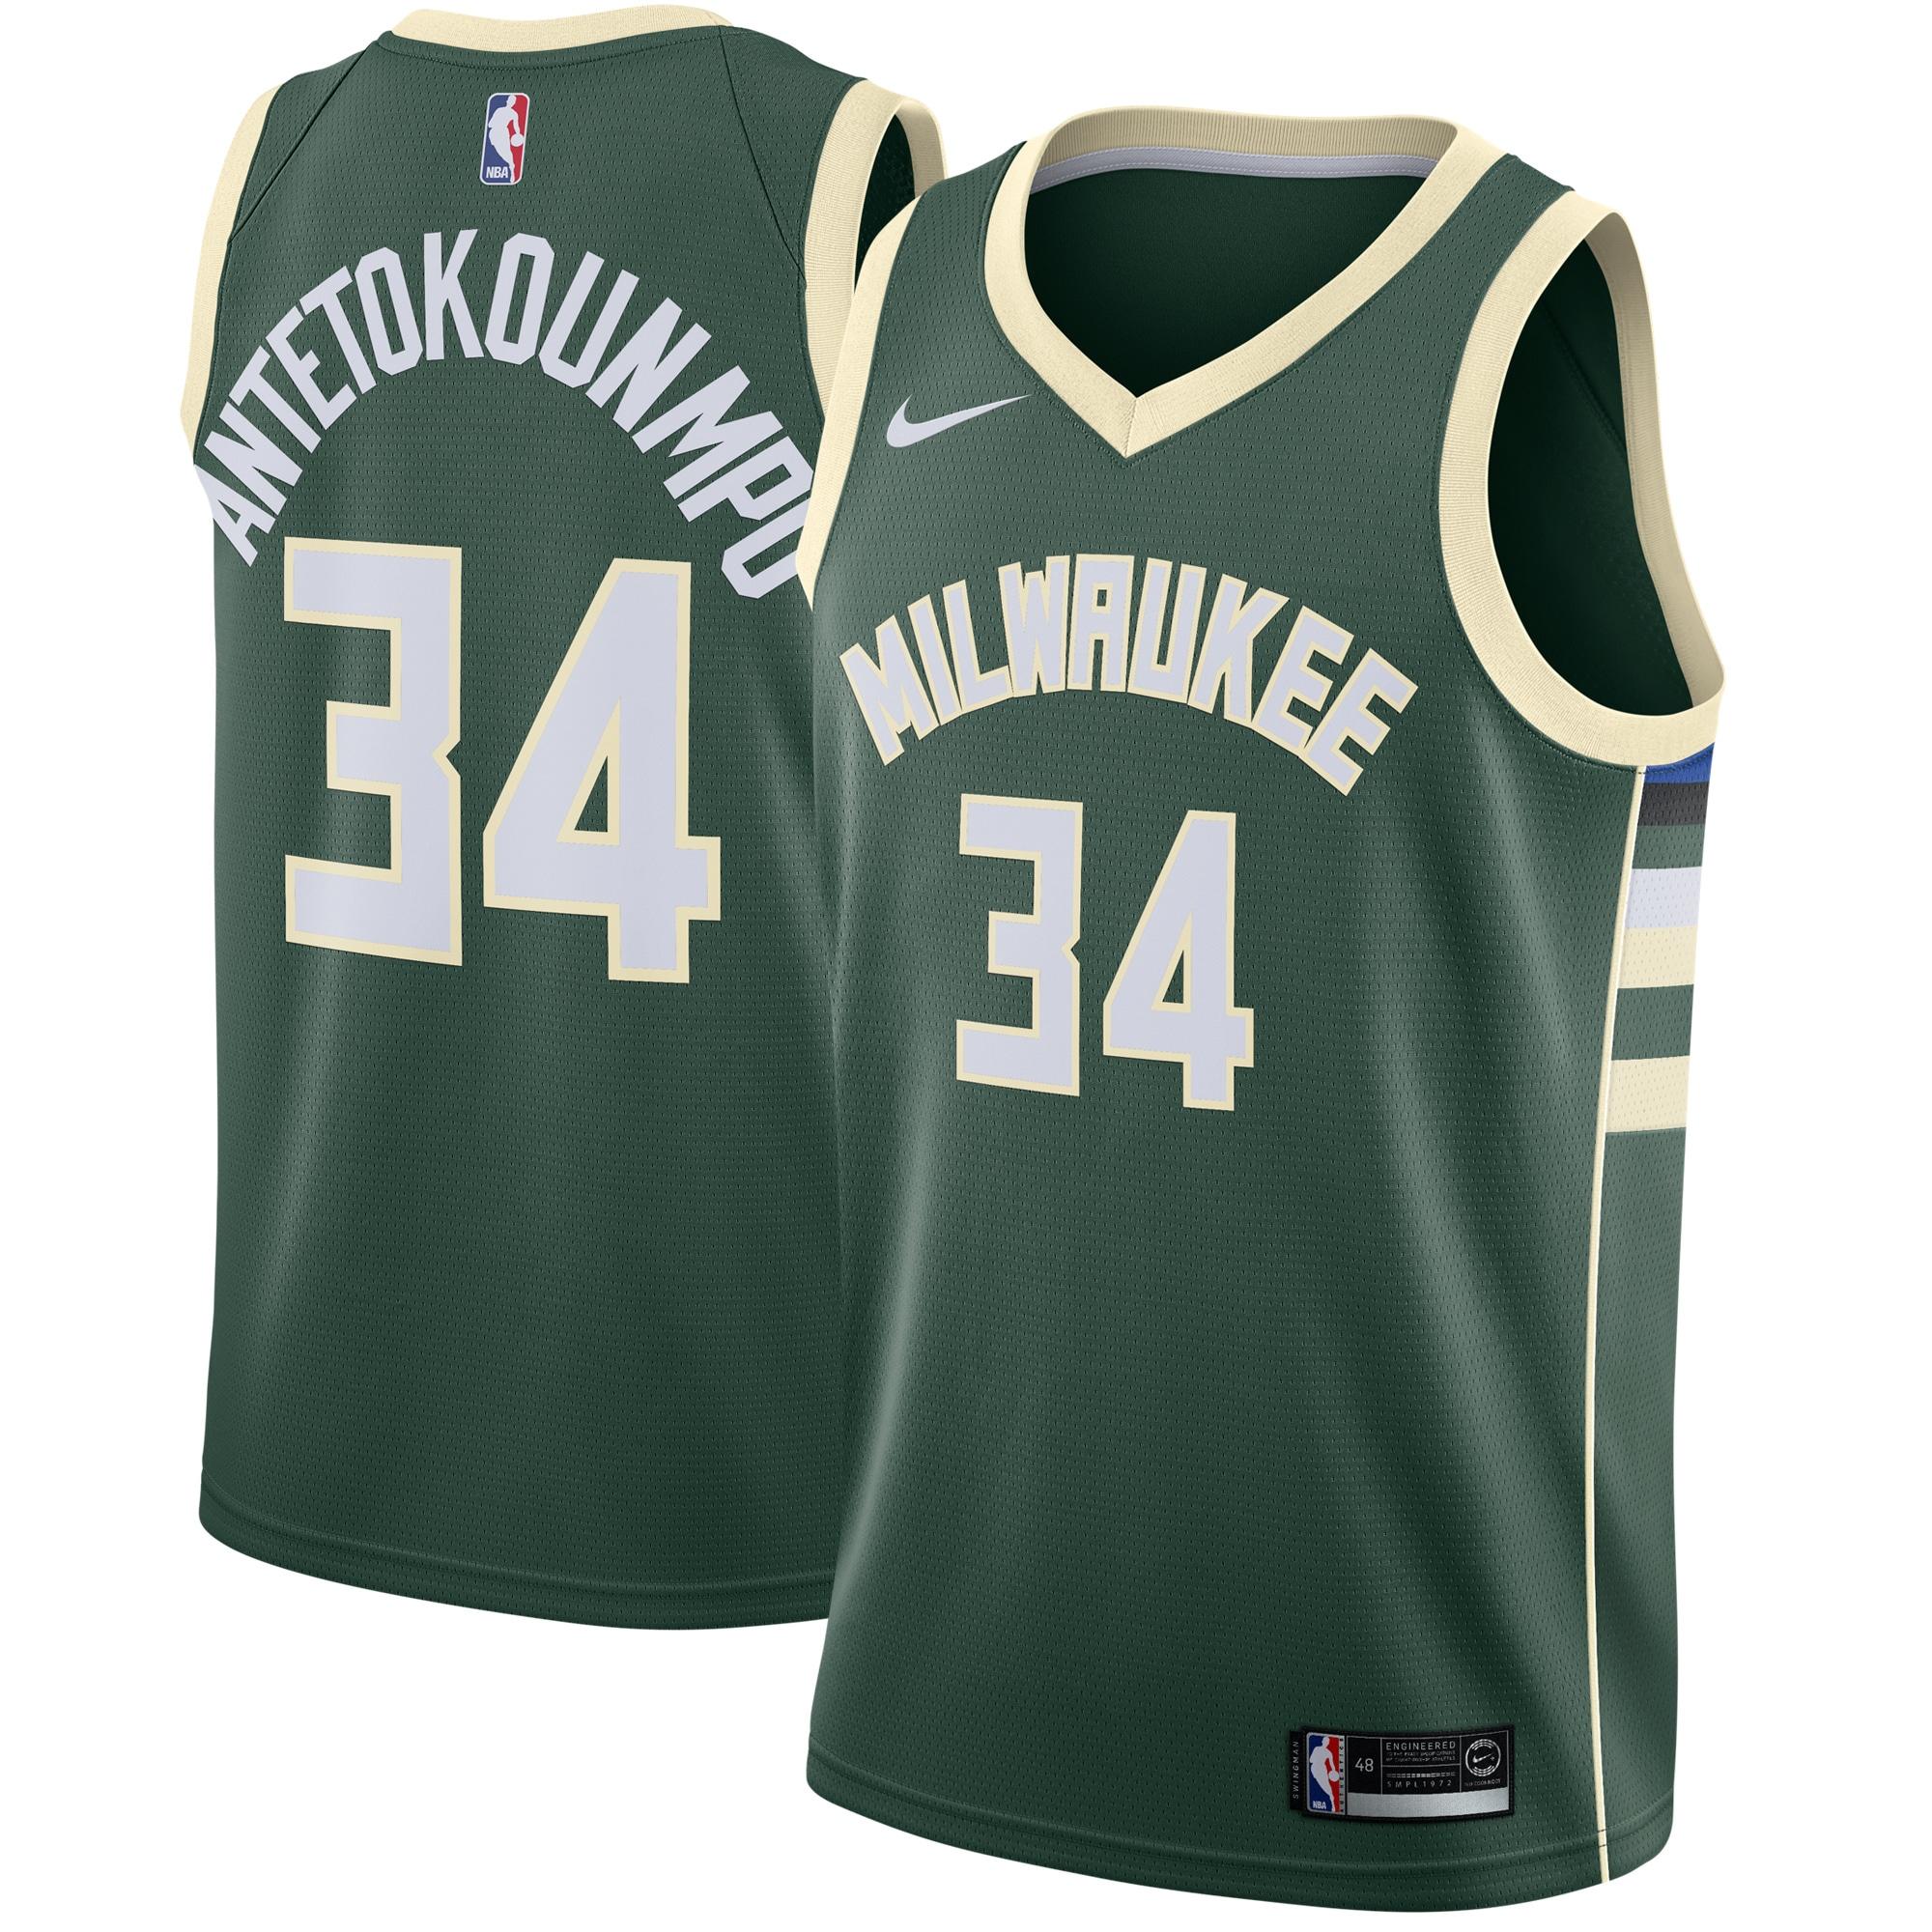 Giannis Antetokounmpo Milwaukee Bucks Nike Swingman Jersey Green - Icon Edition